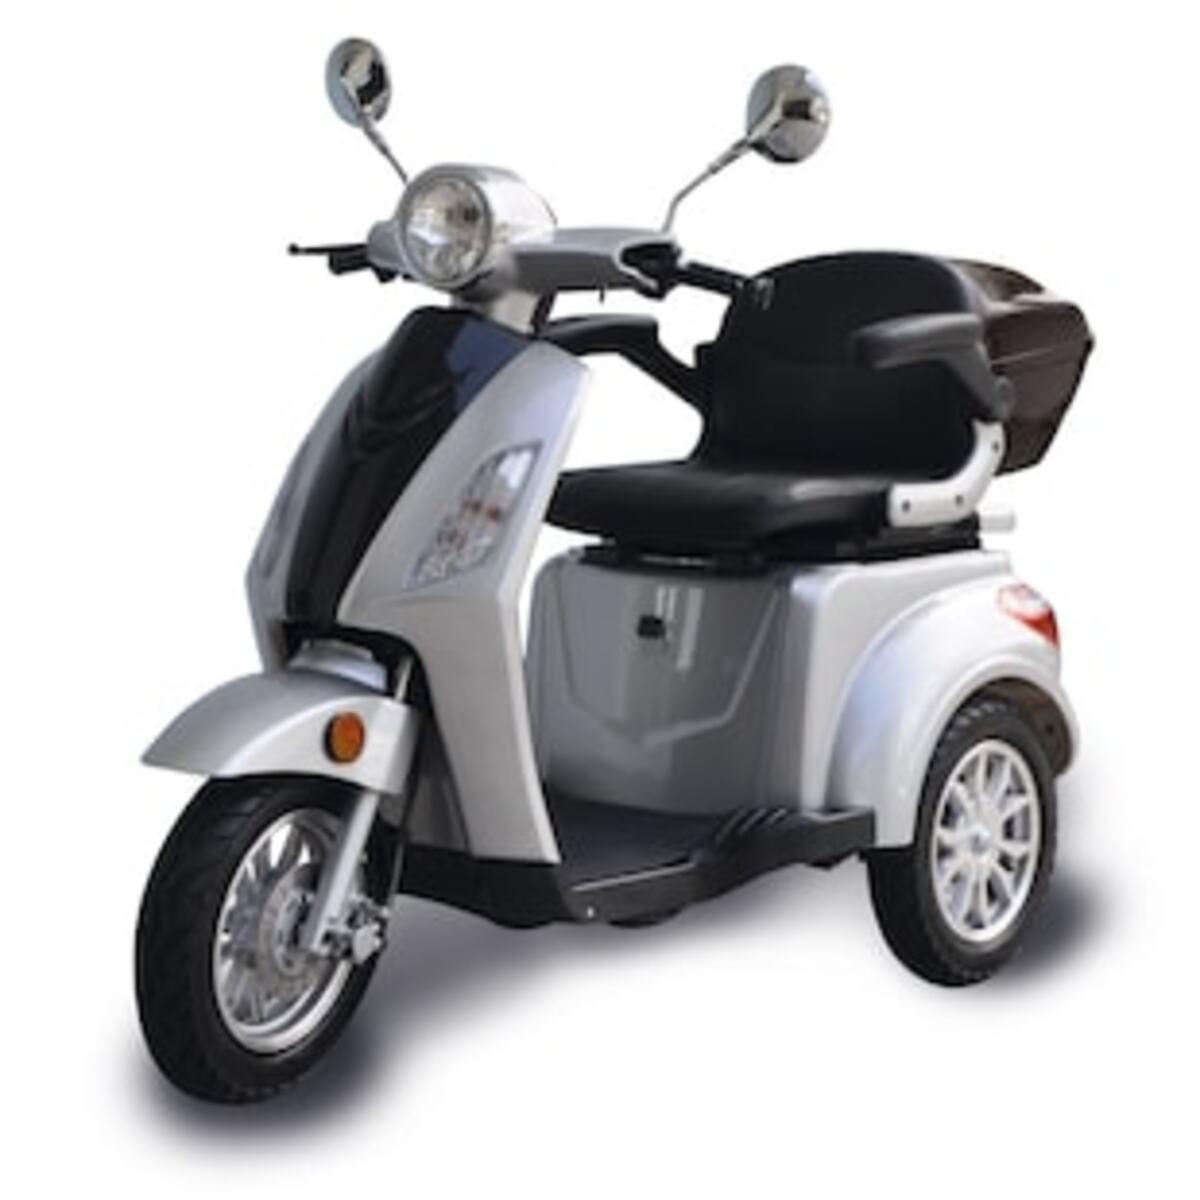 Bild 2 von Aktivimo 3-Rad E-Mobil Rimini